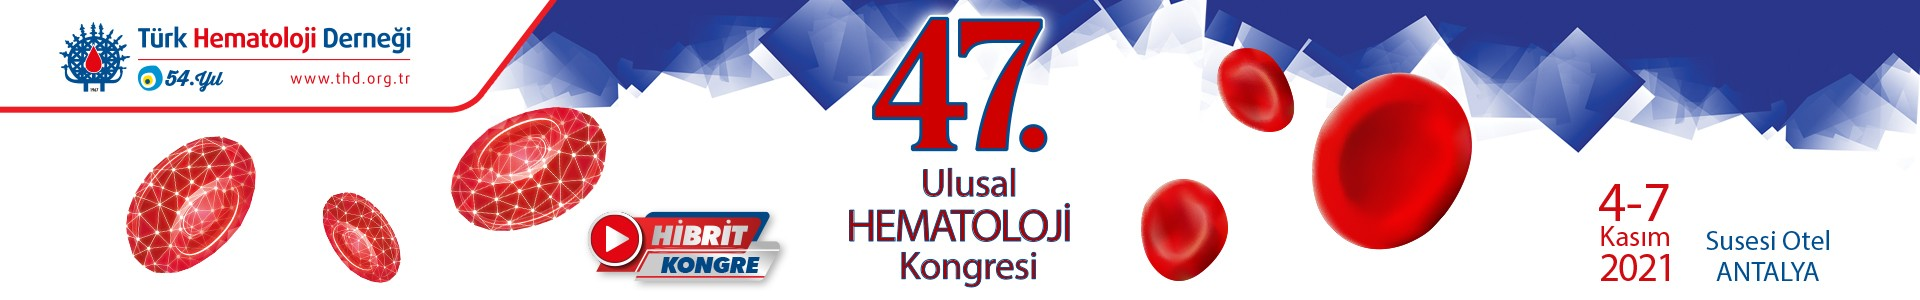 47. Ulusal Hematoloji Kongresi 2021